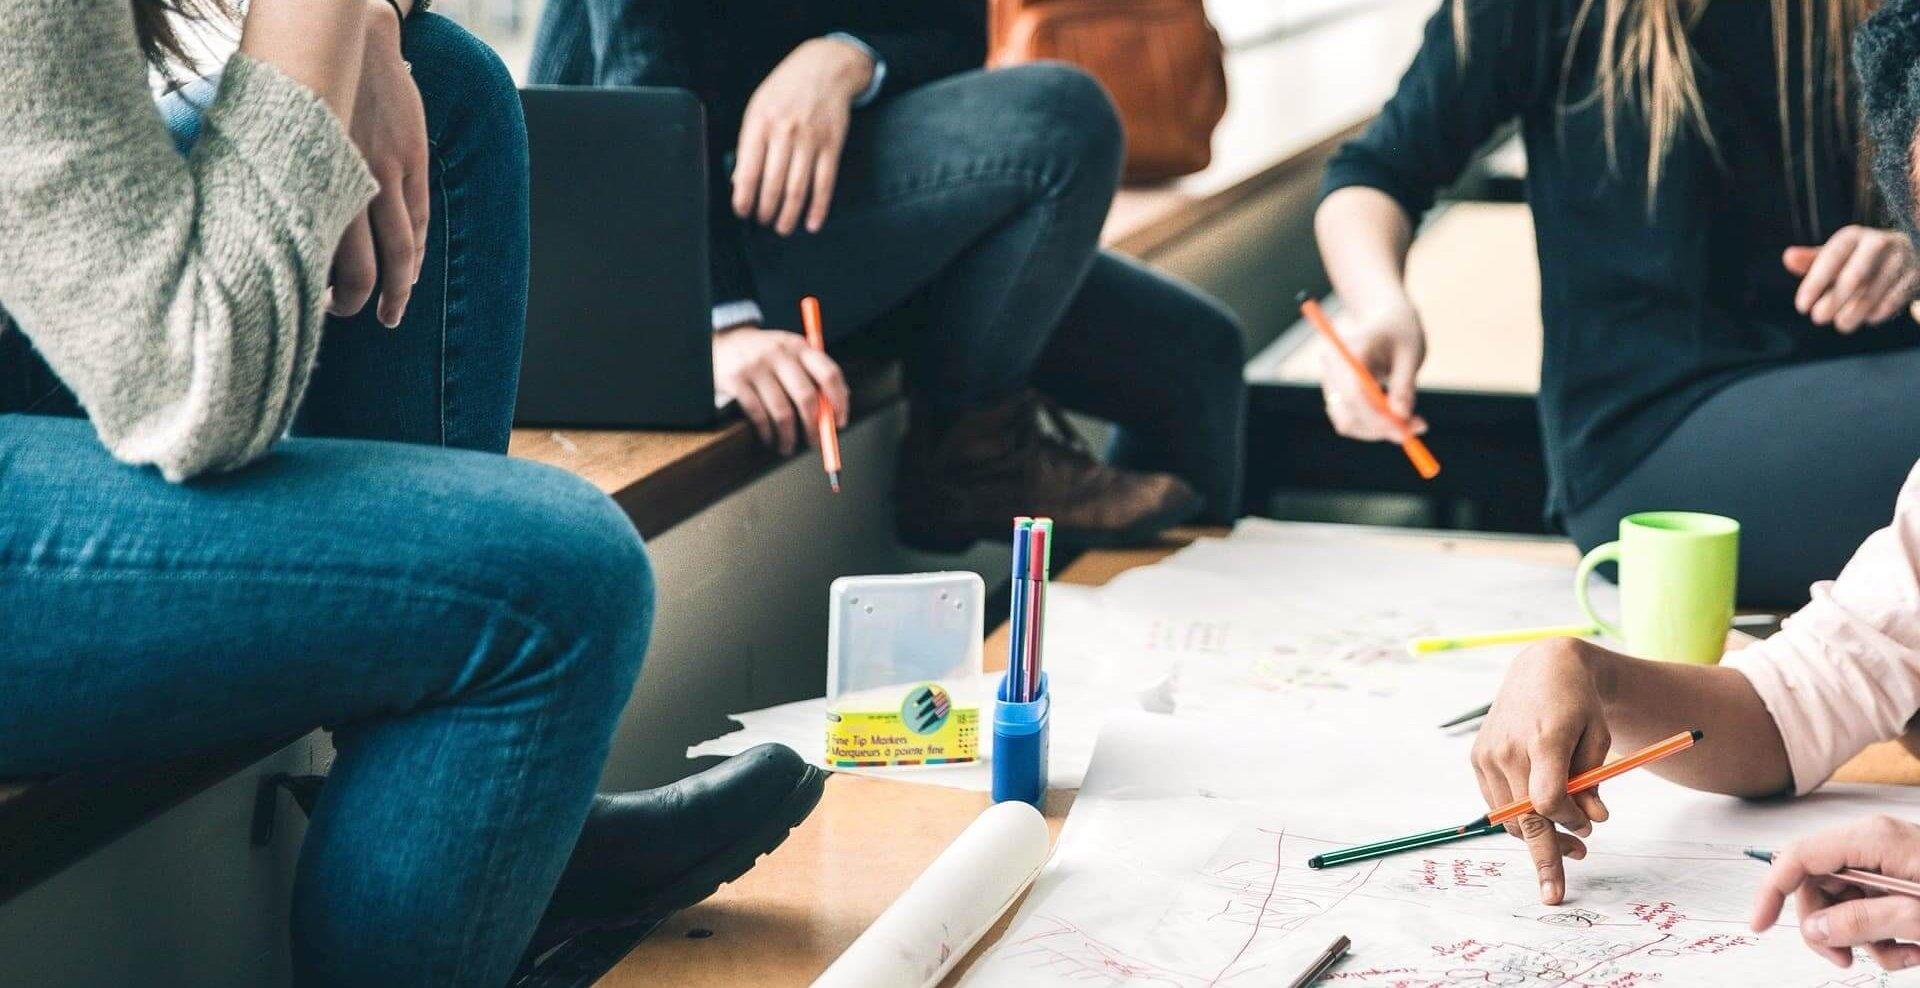 INEHO - Travail collaboratif et performance - team building